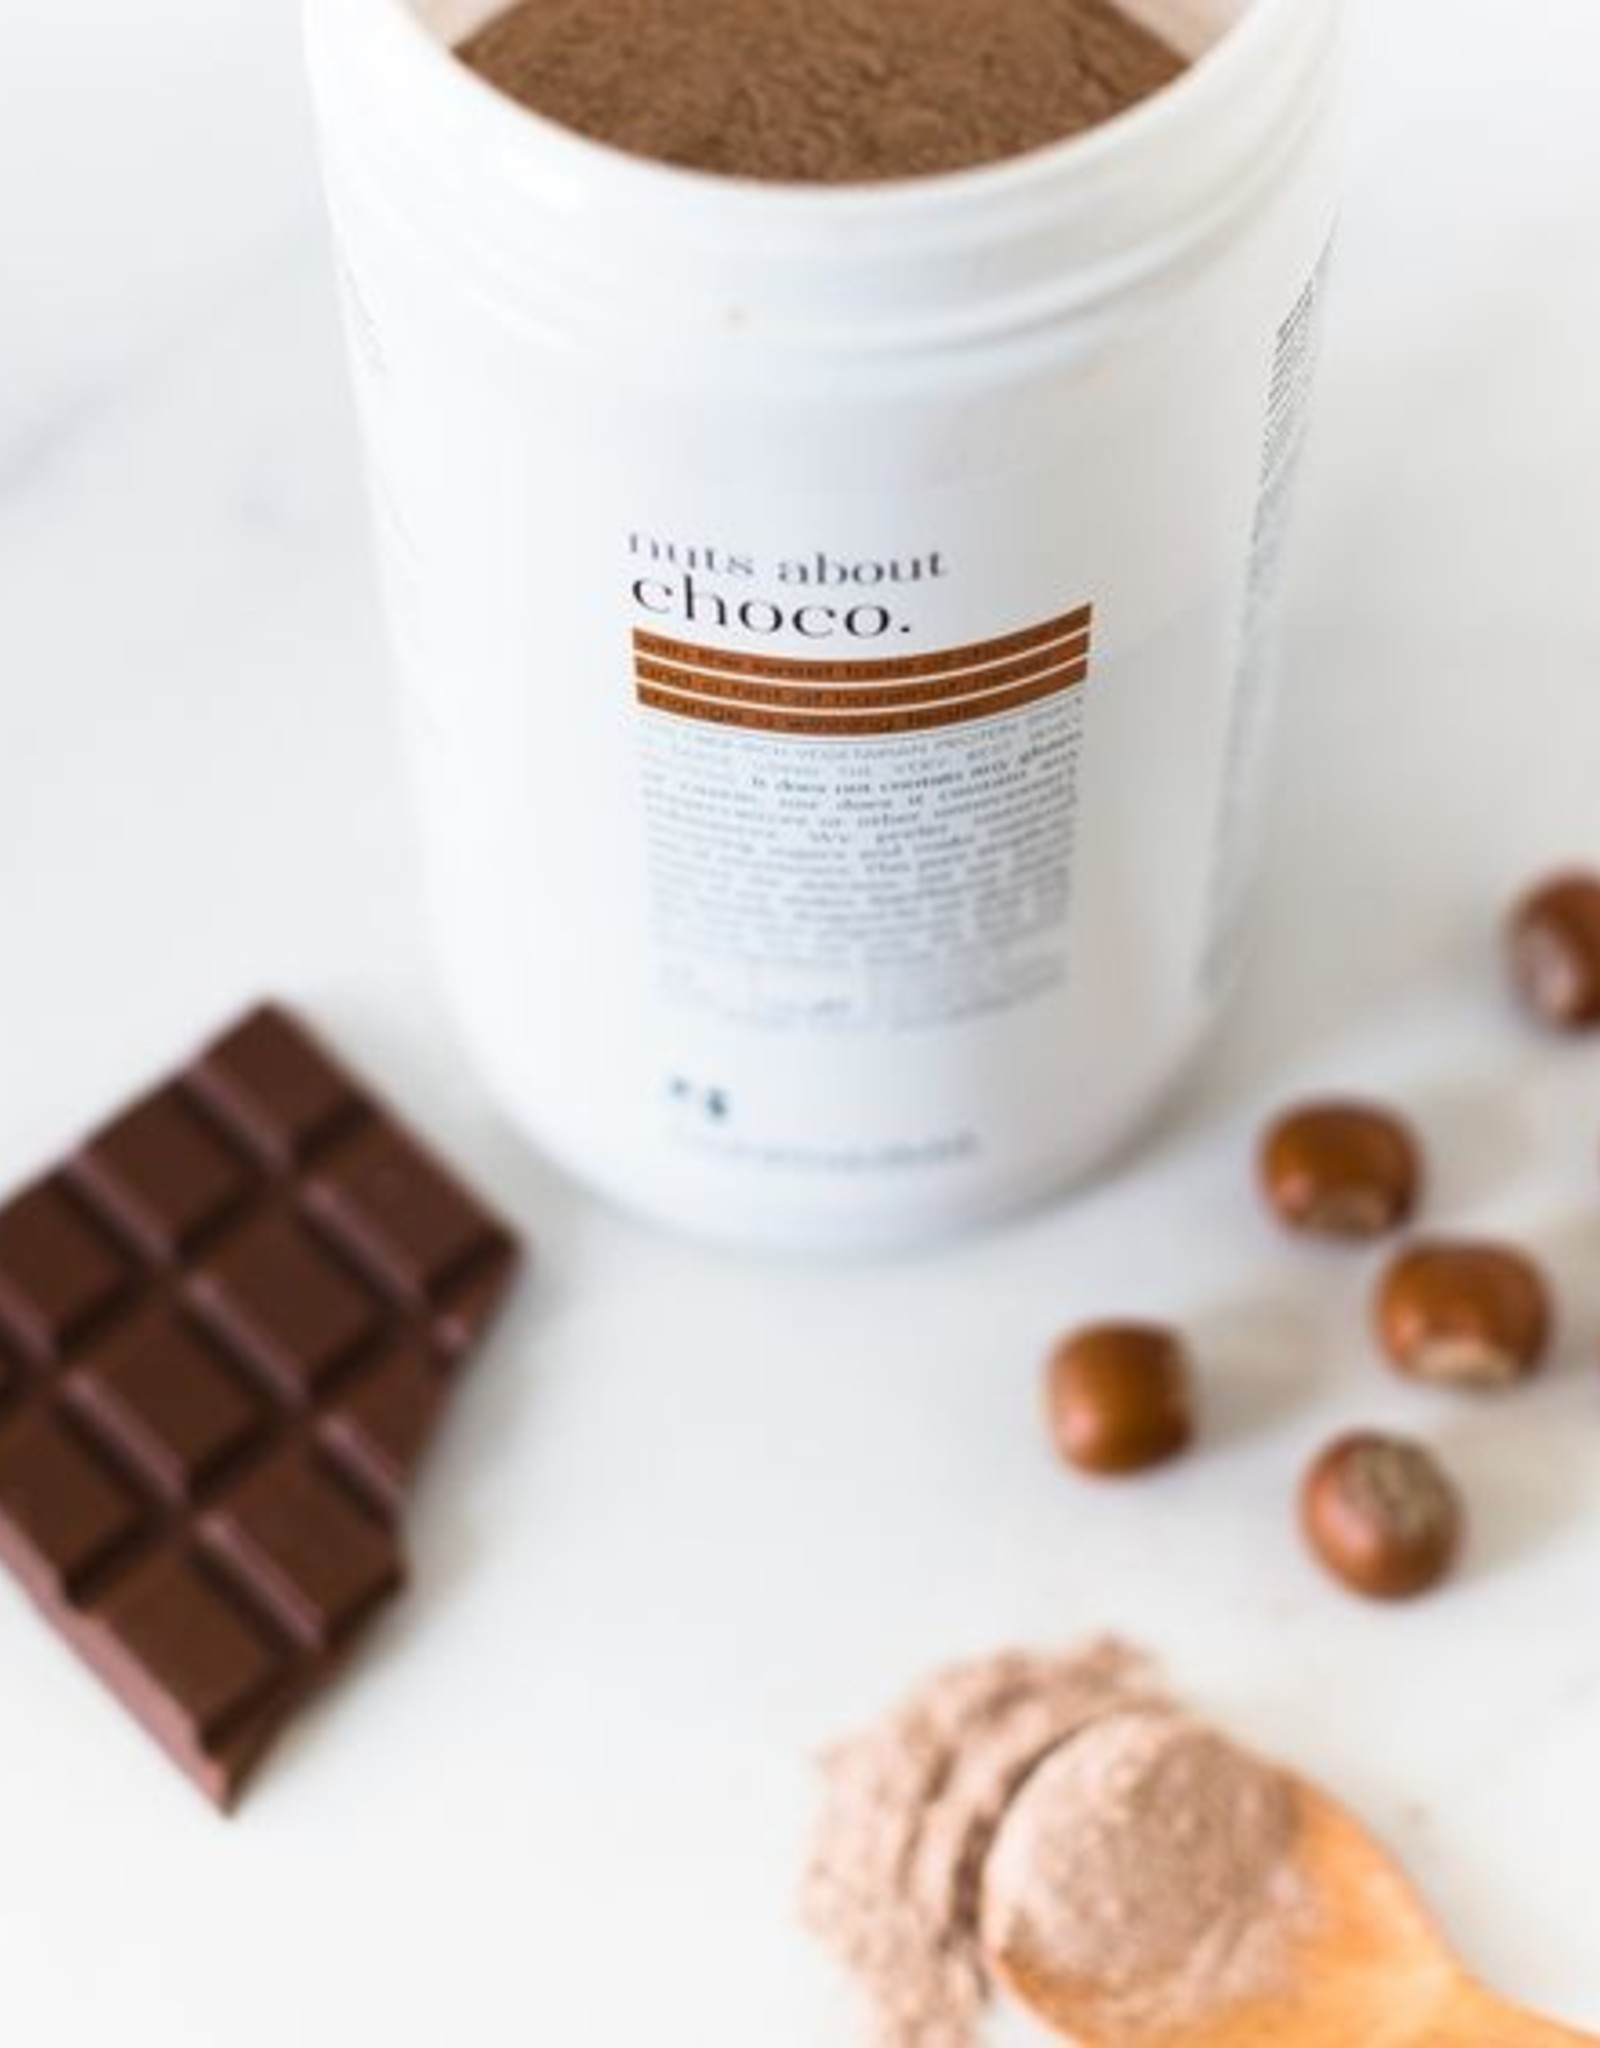 RainPharma Rainpharma - Nuts about Choco